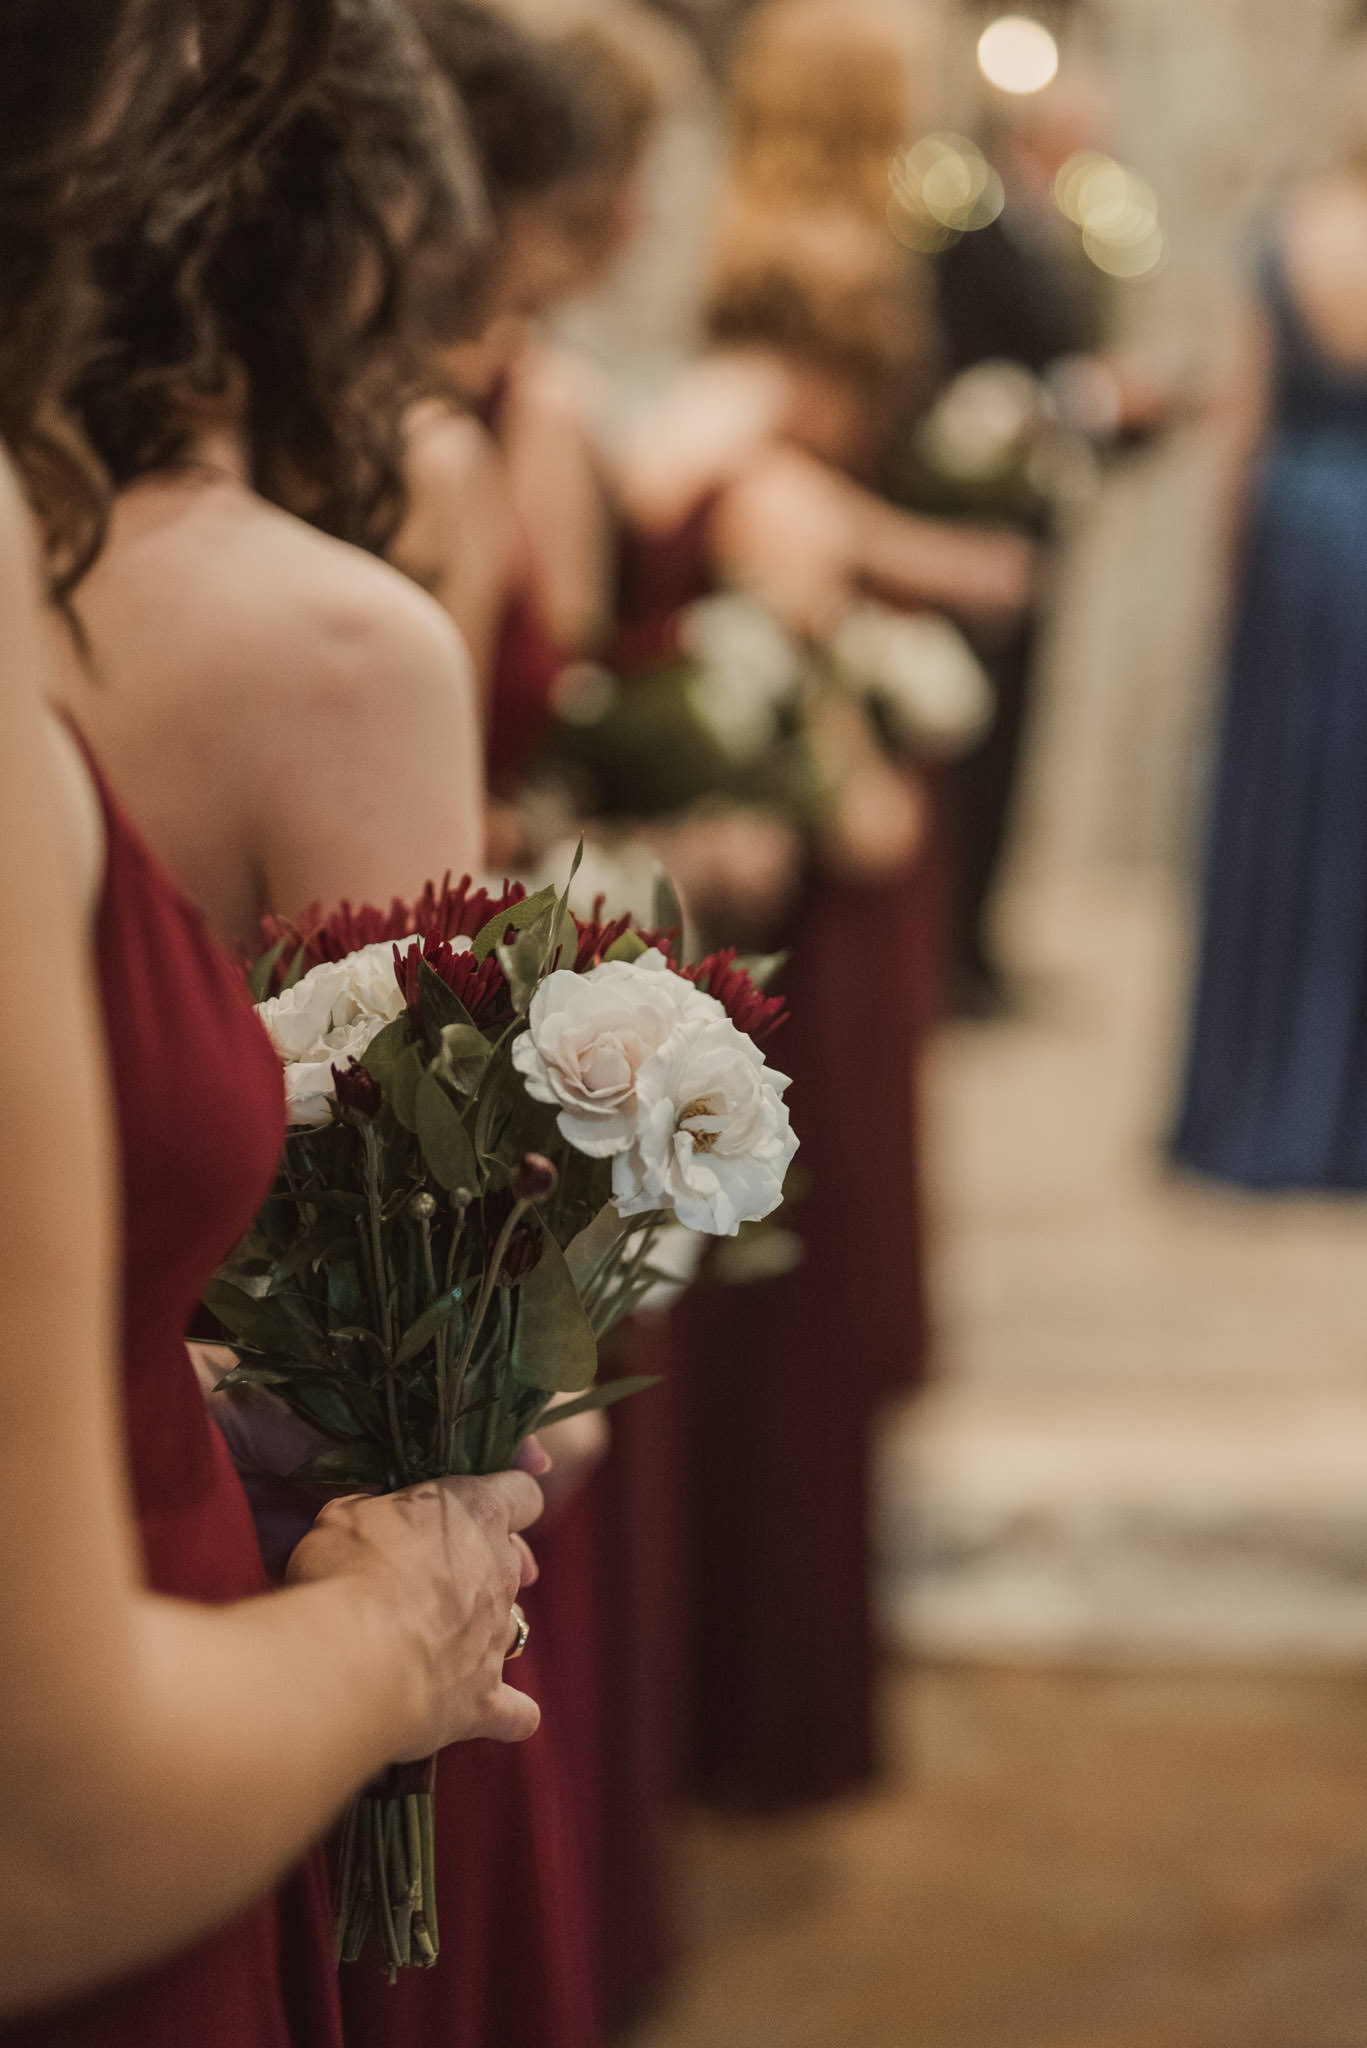 nichole-kyle-magnolia-bells-magnolia-wedding-sm-96.jpg